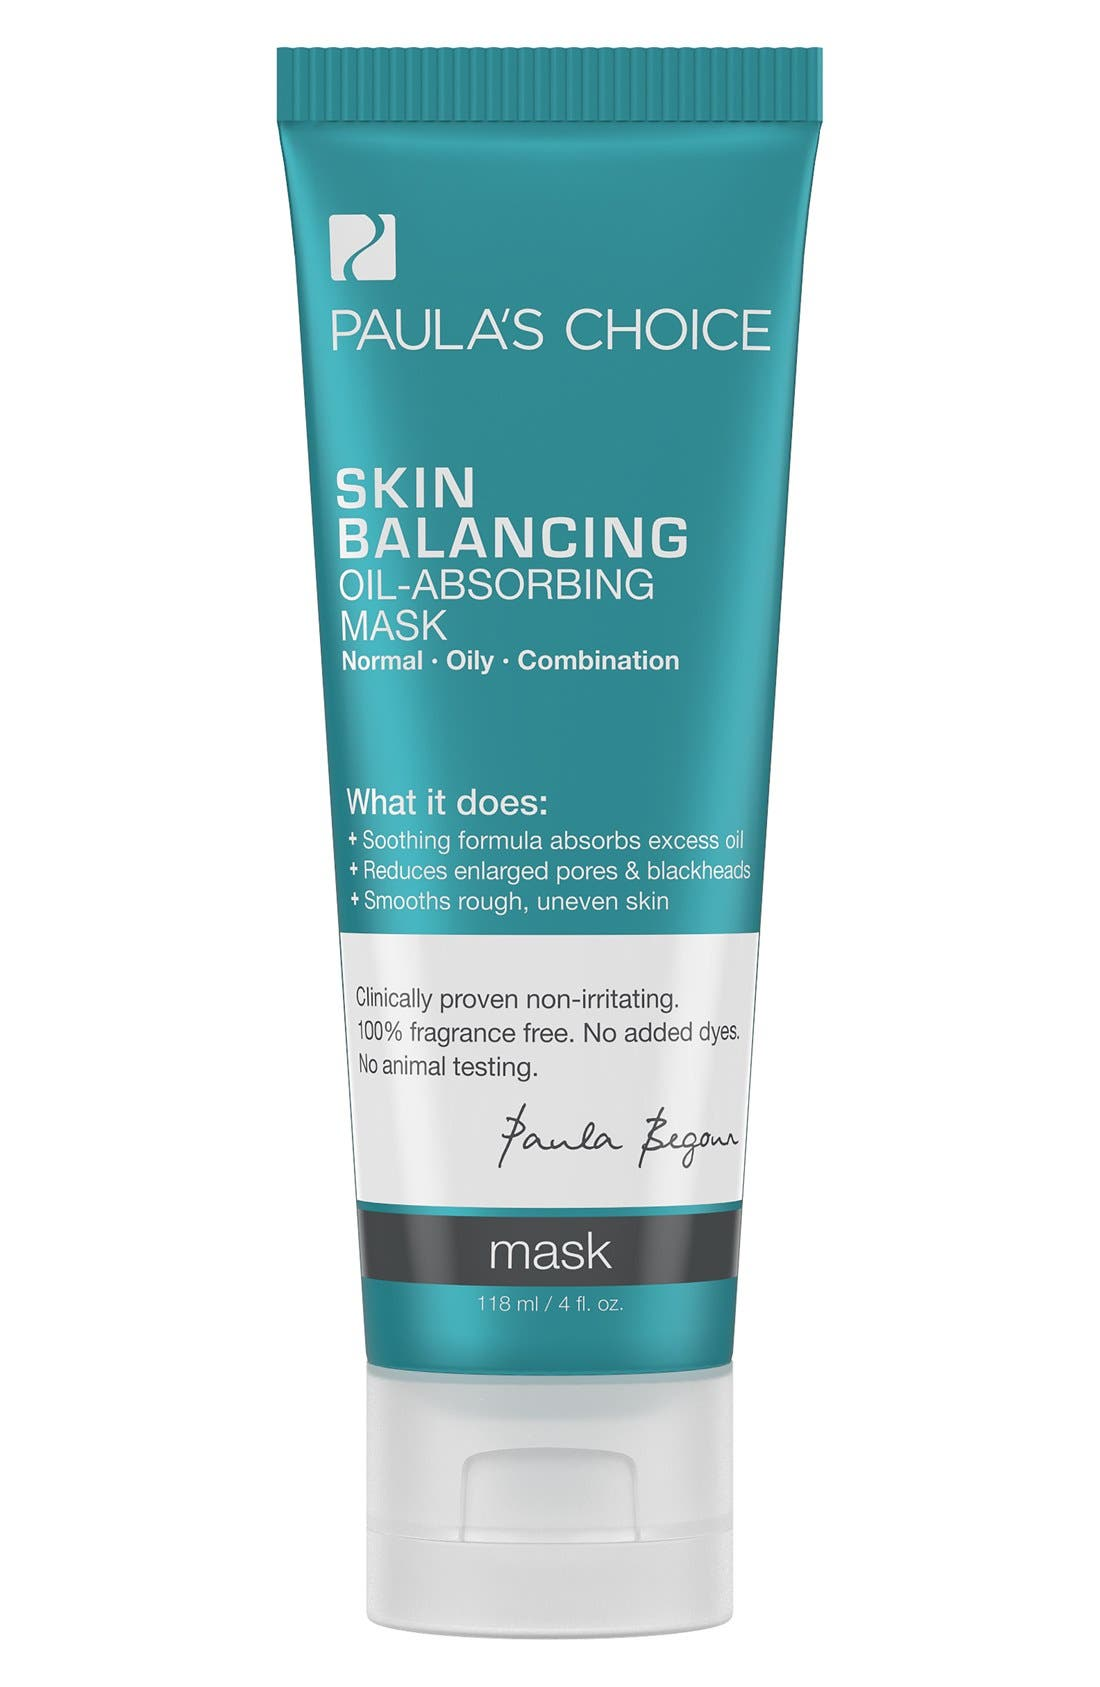 Paula's Choice Skin Balancing Oil-Absorbing Mask